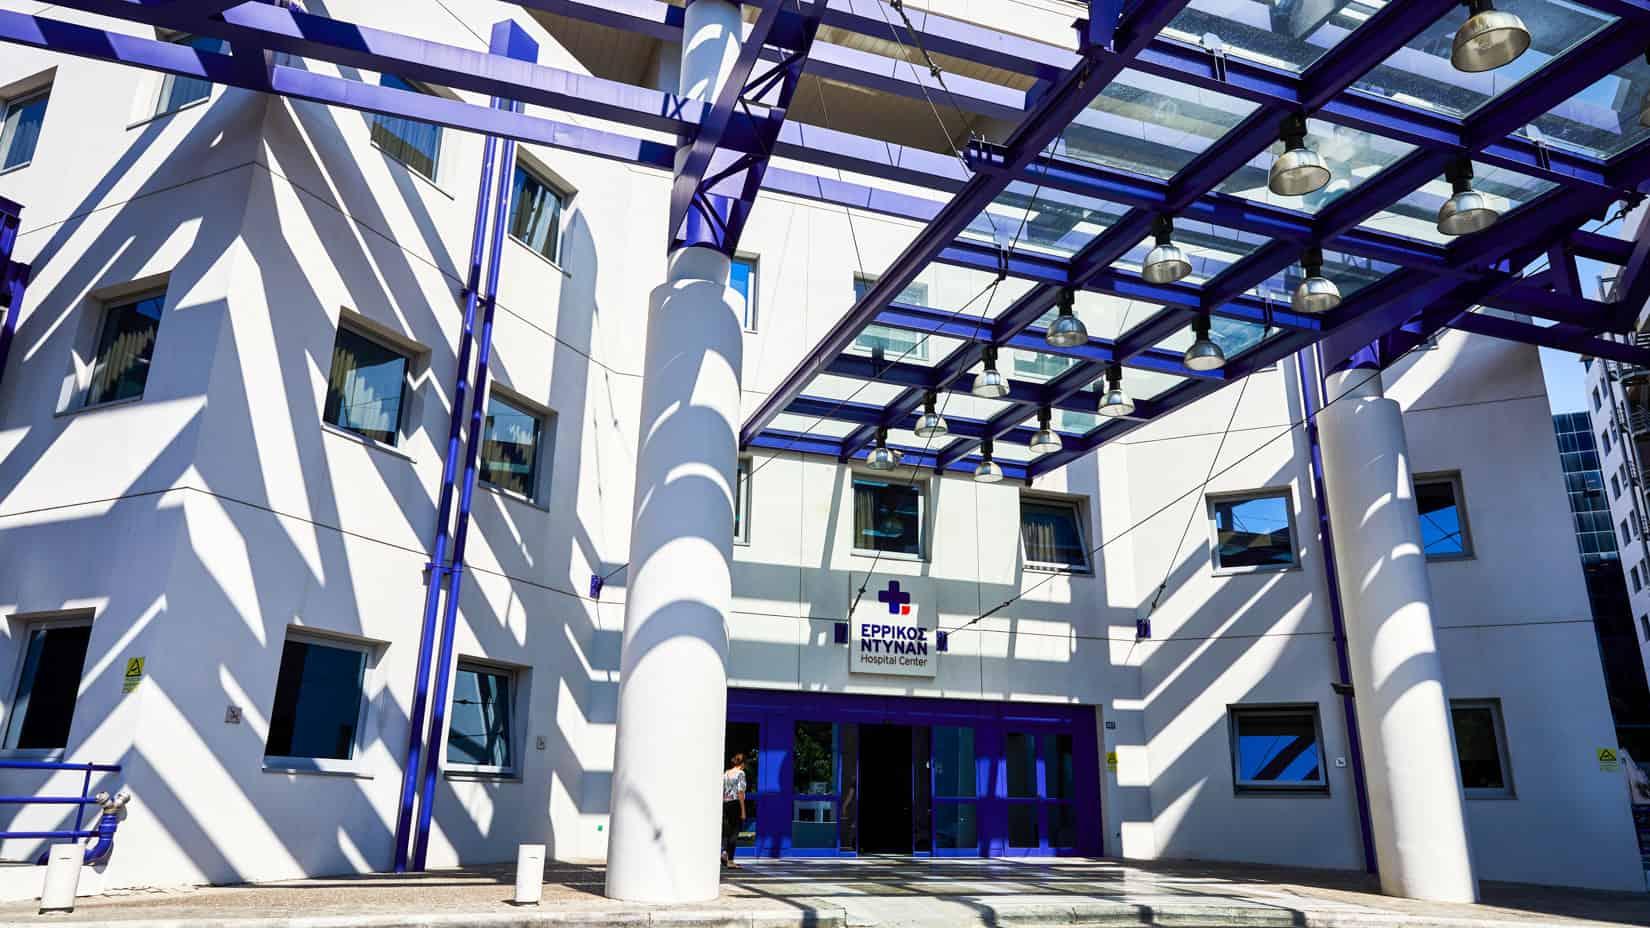 The entrance to a Greek hospital.